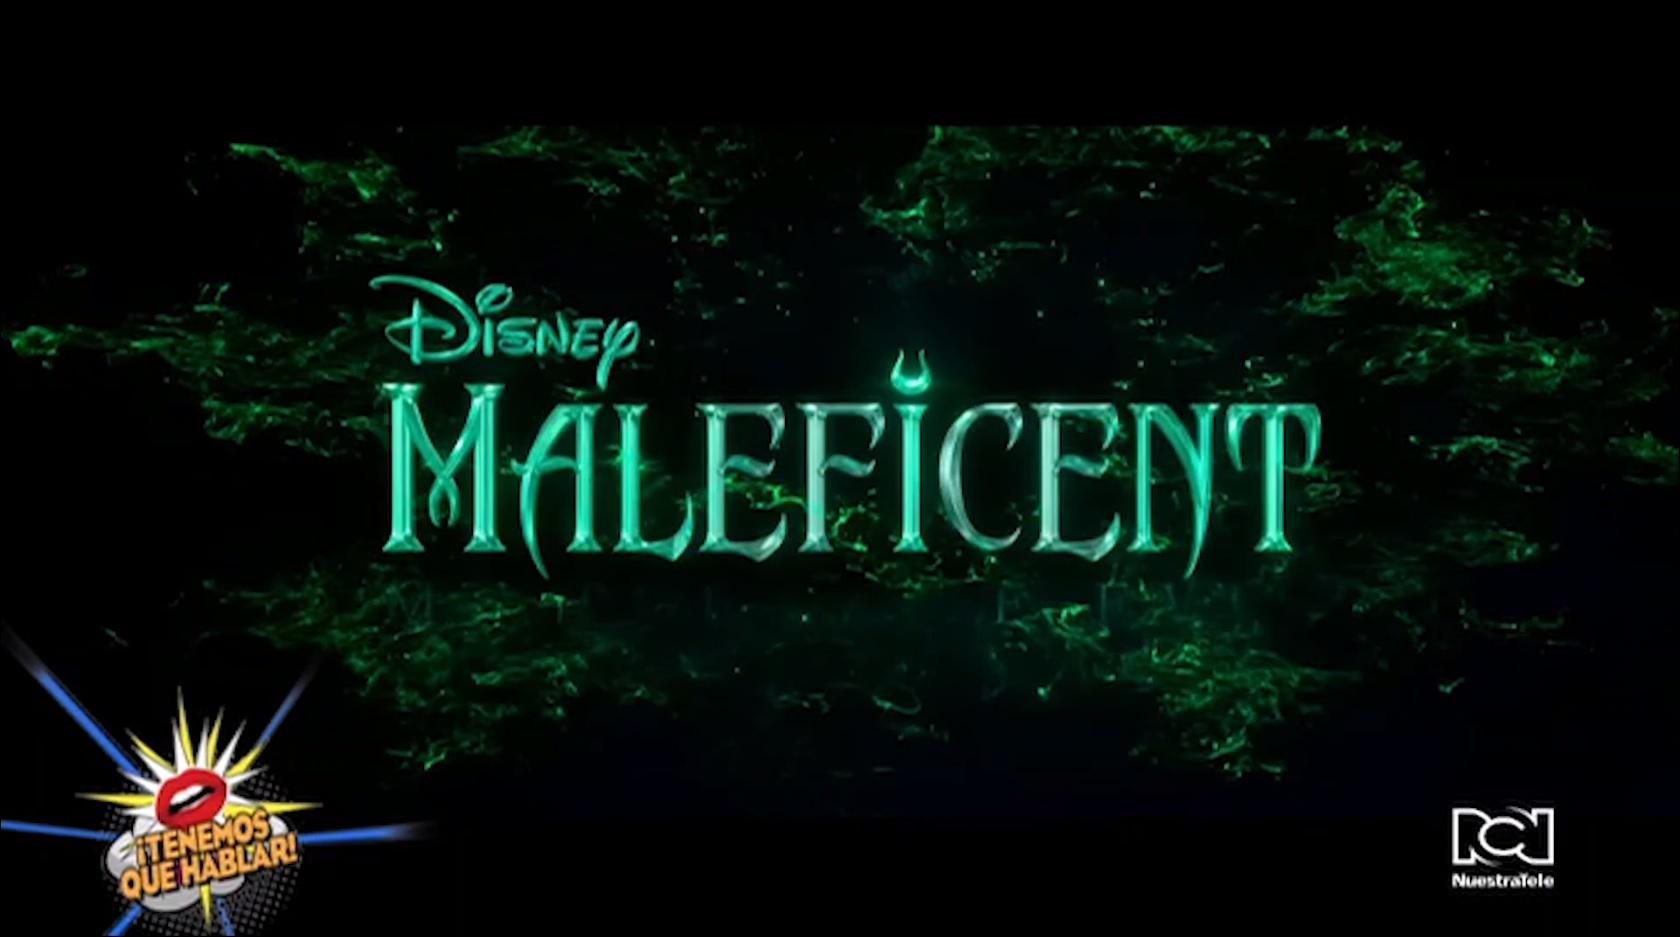 'Maleficent: Mistress of Evil' llegará este 18 de octubre a salas de cine